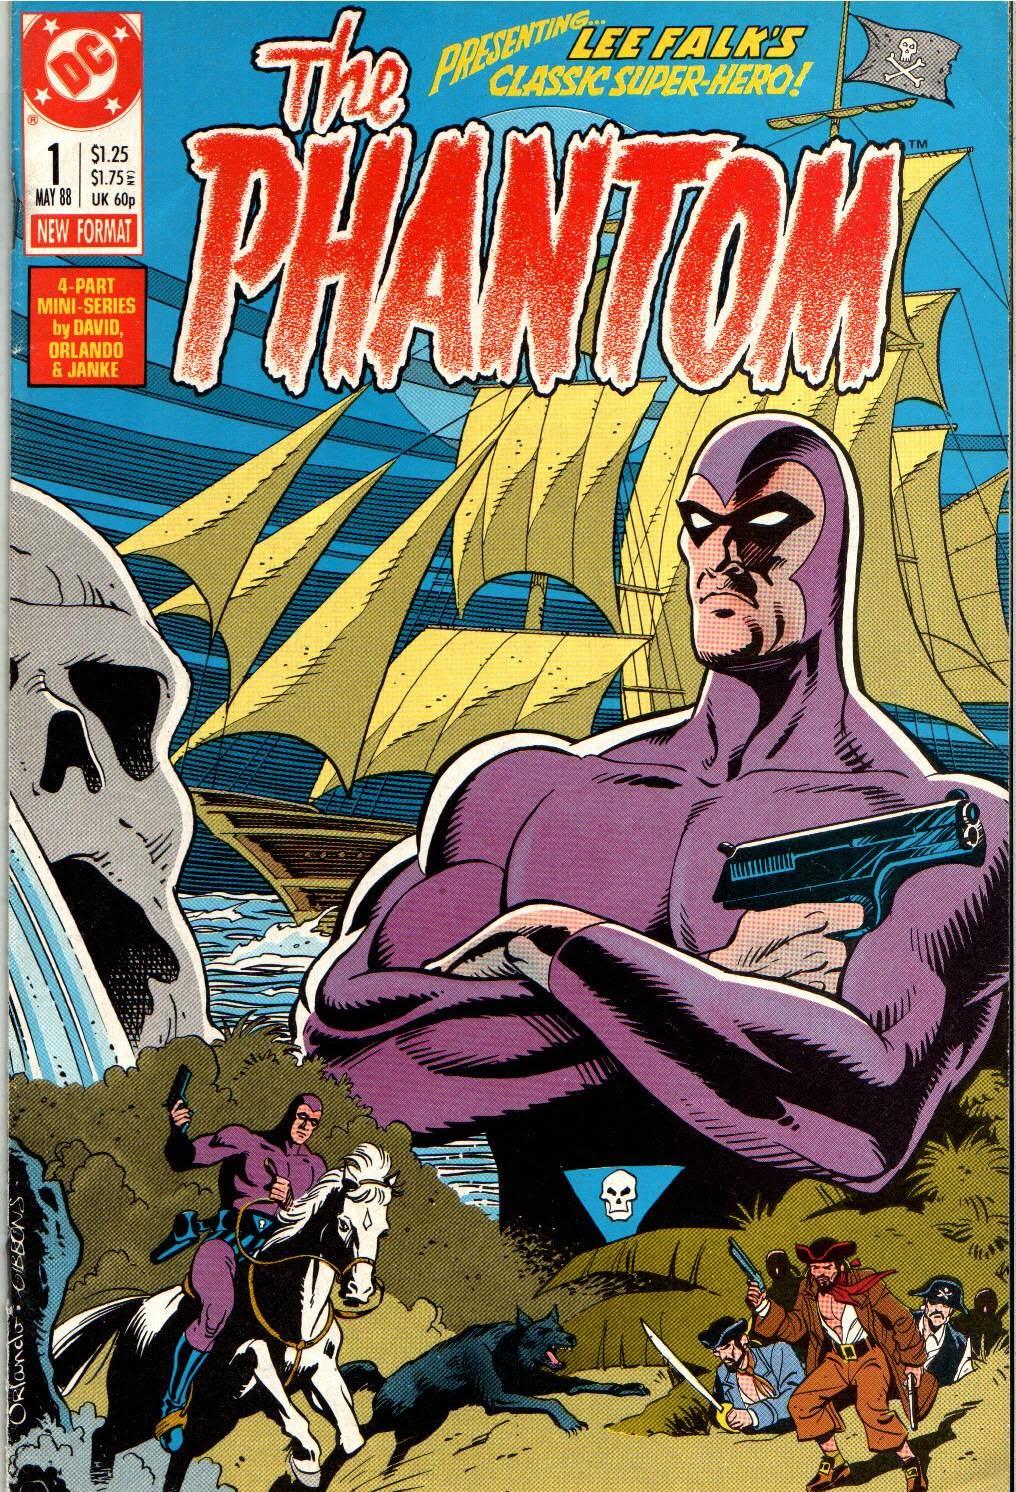 Read online The Phantom (1988) comic -  Issue #1 - 1